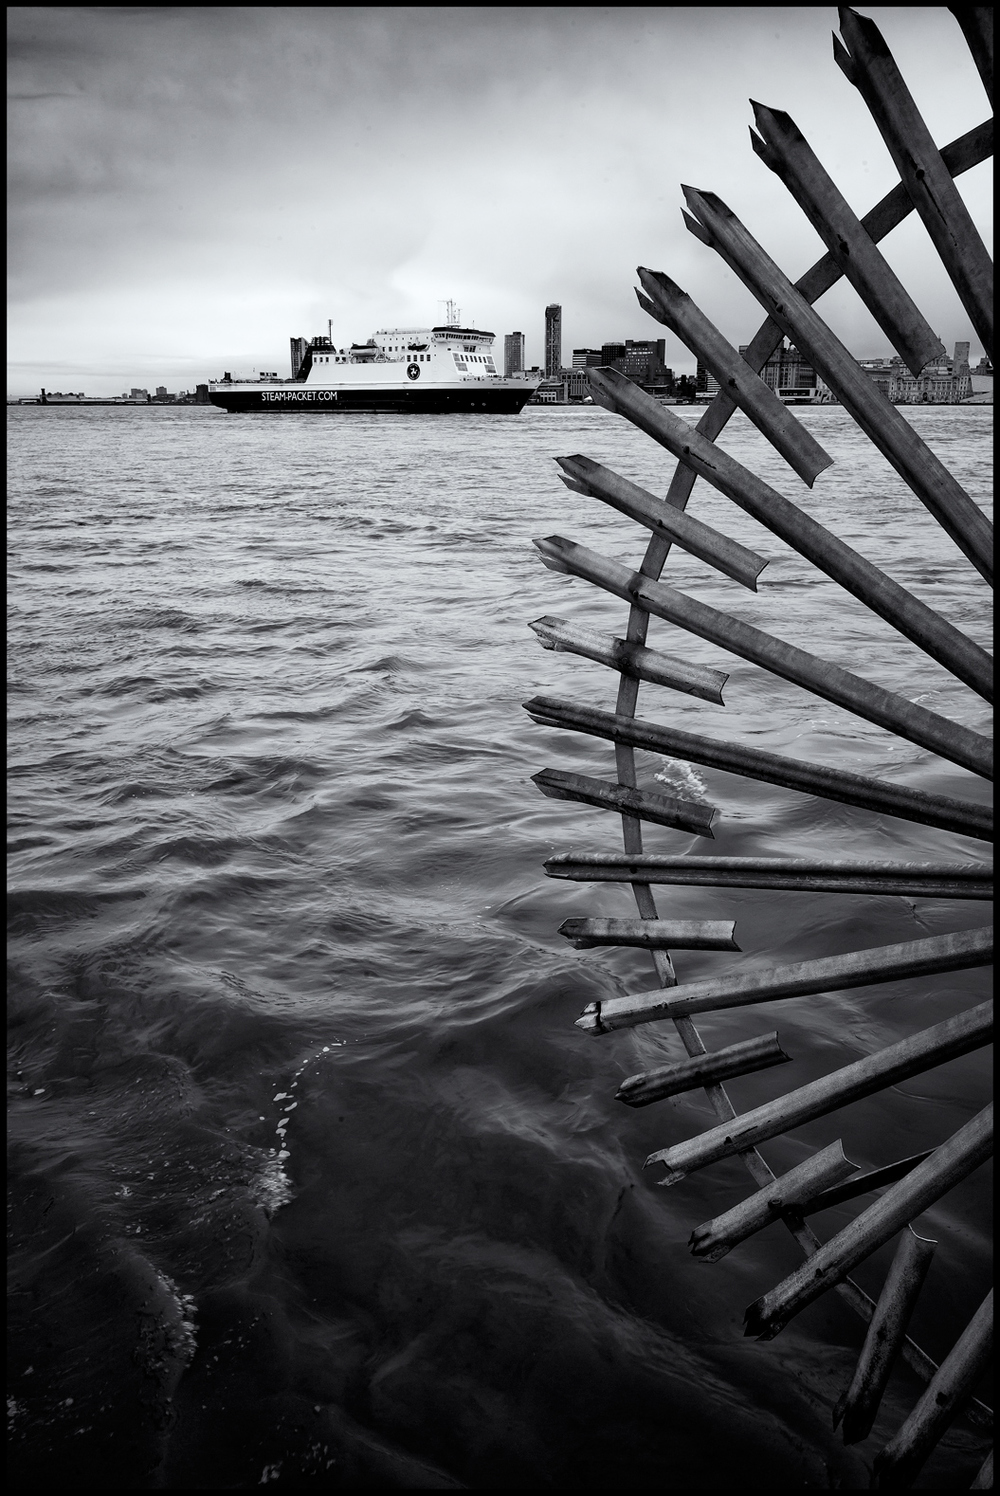 Ferry_1036306_2.jpg